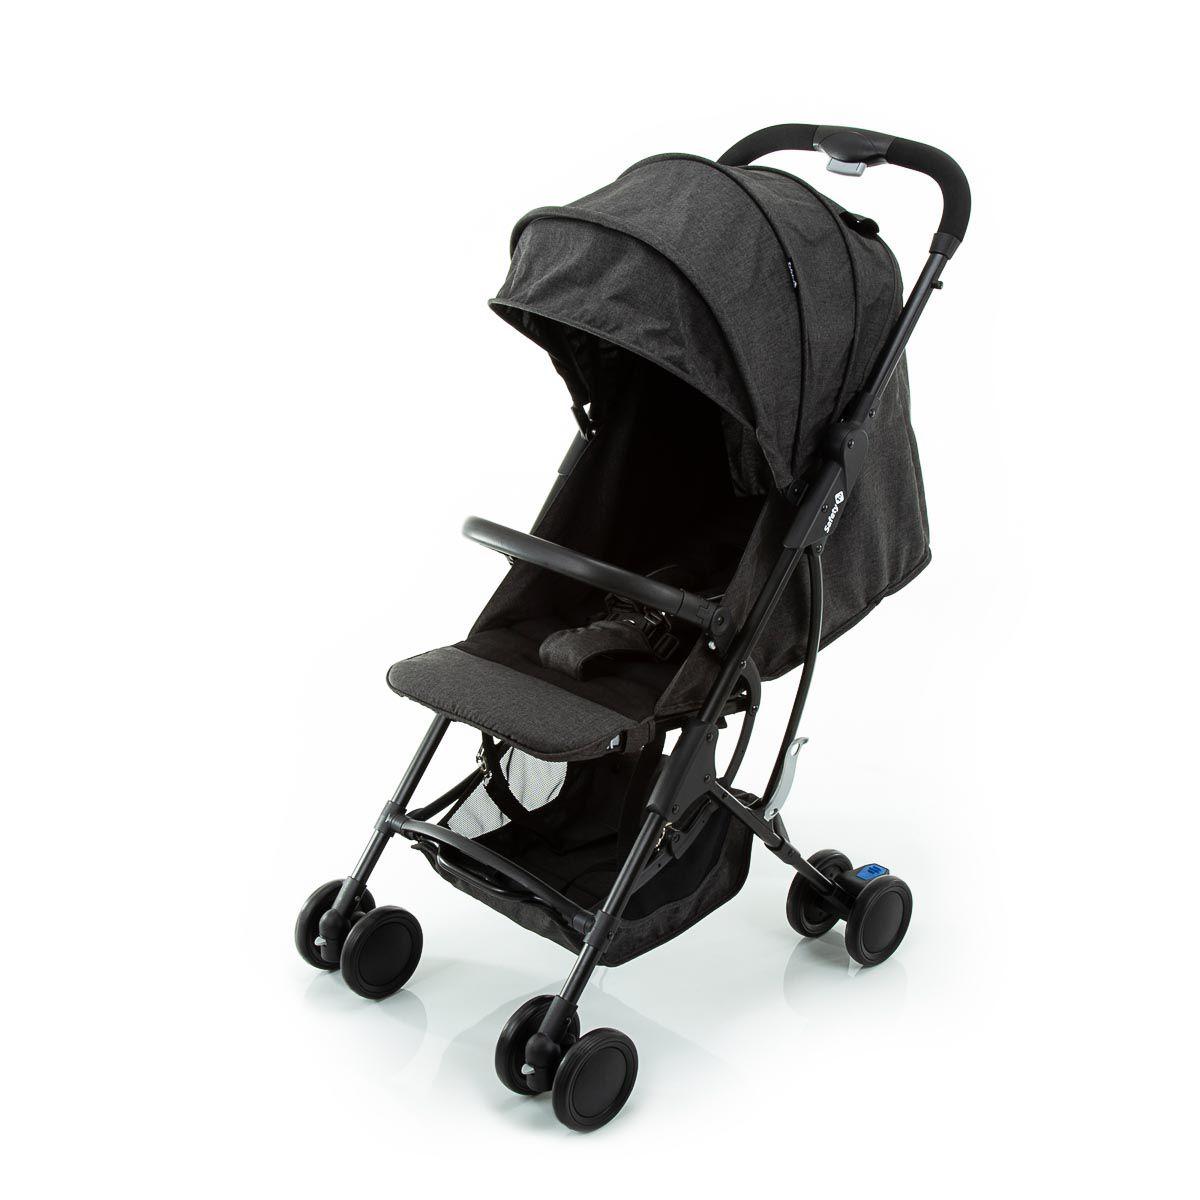 Carrinho Bebê Next Black Denin - Safety 1st